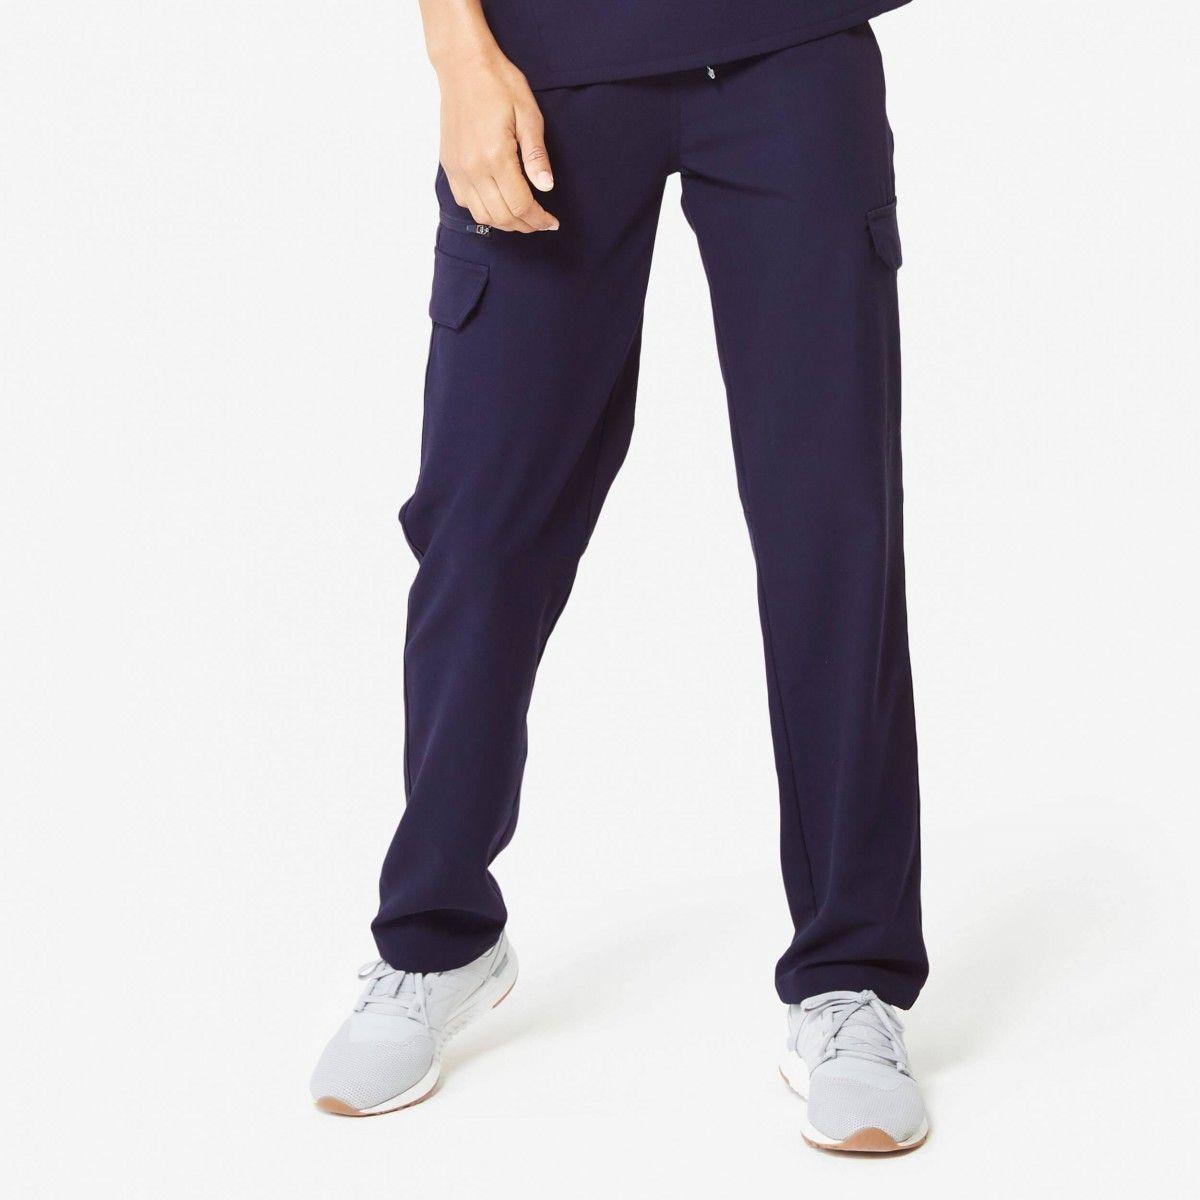 73a4c102cfb Womens Avadi - Cargo Scrub Pants | Products | Scrub pants, Pants, Scrubs